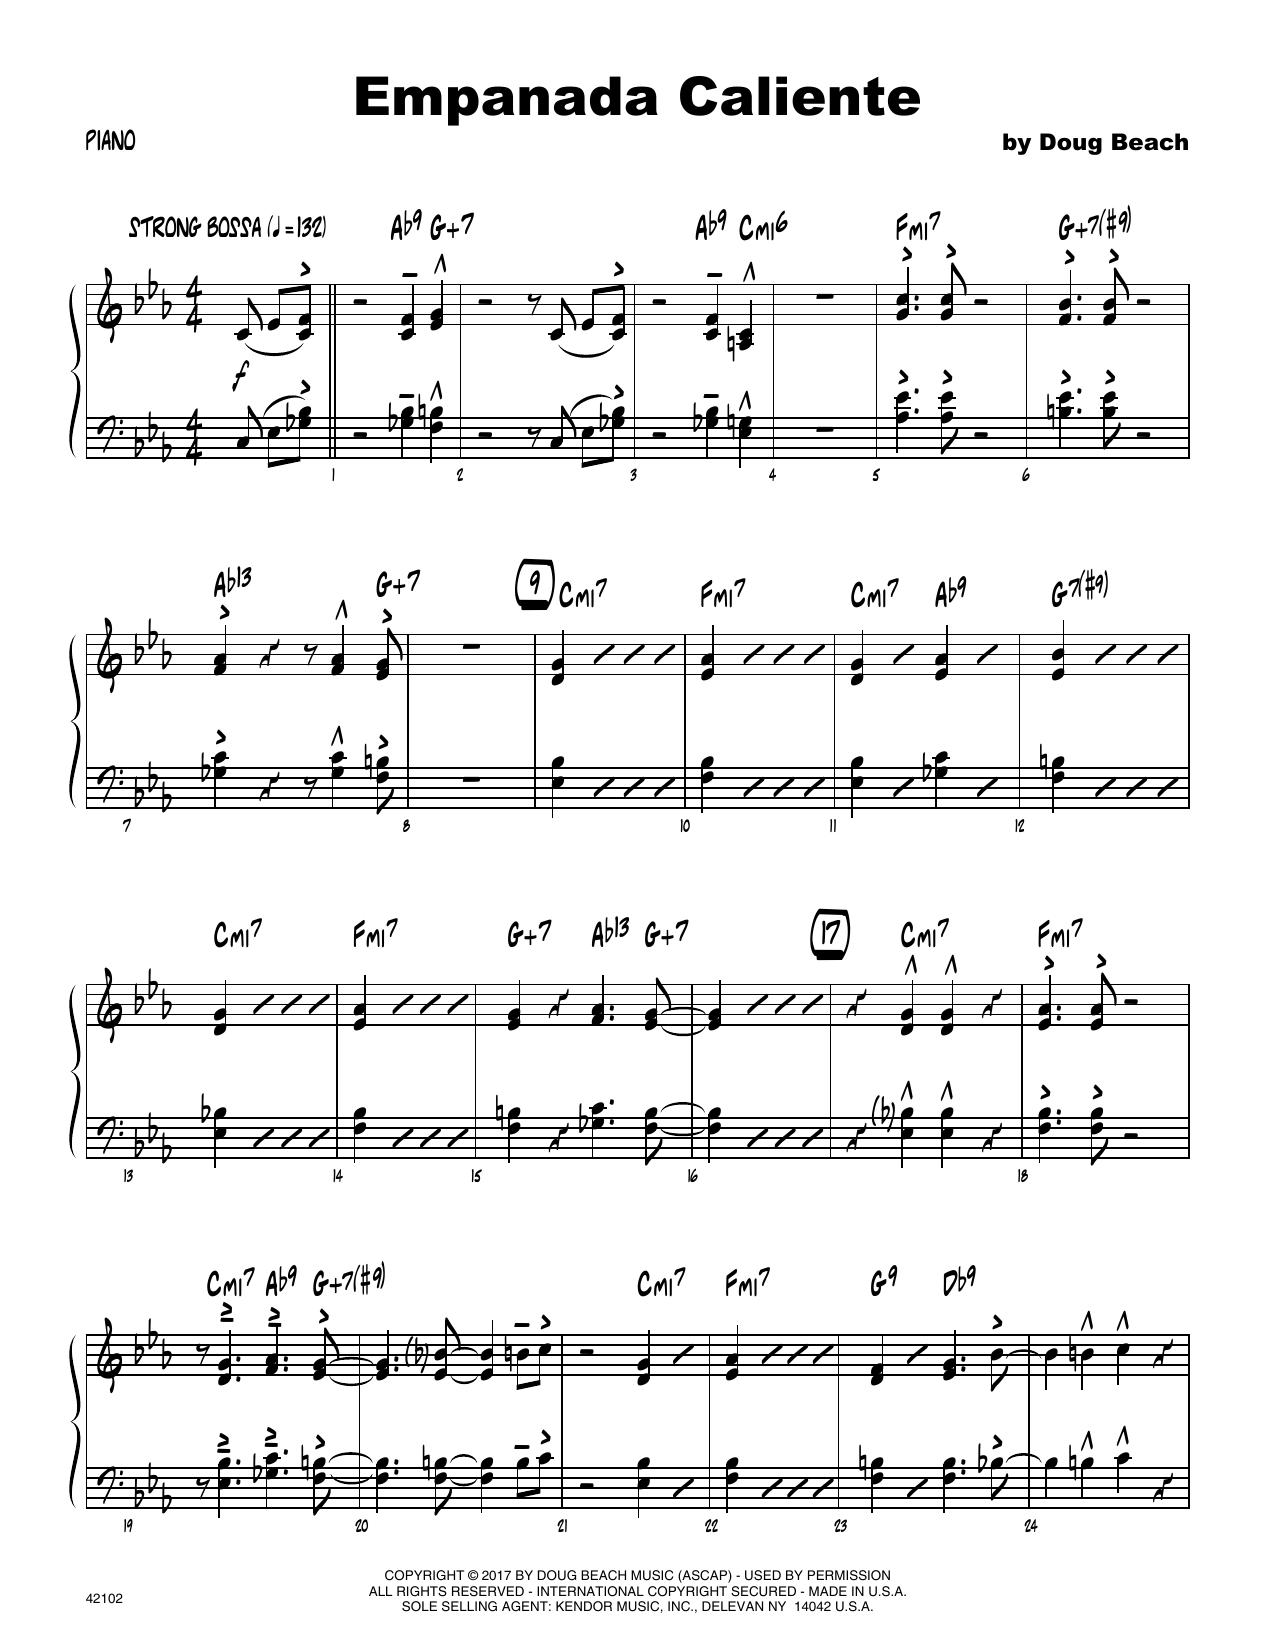 Empanada Caliente - Piano